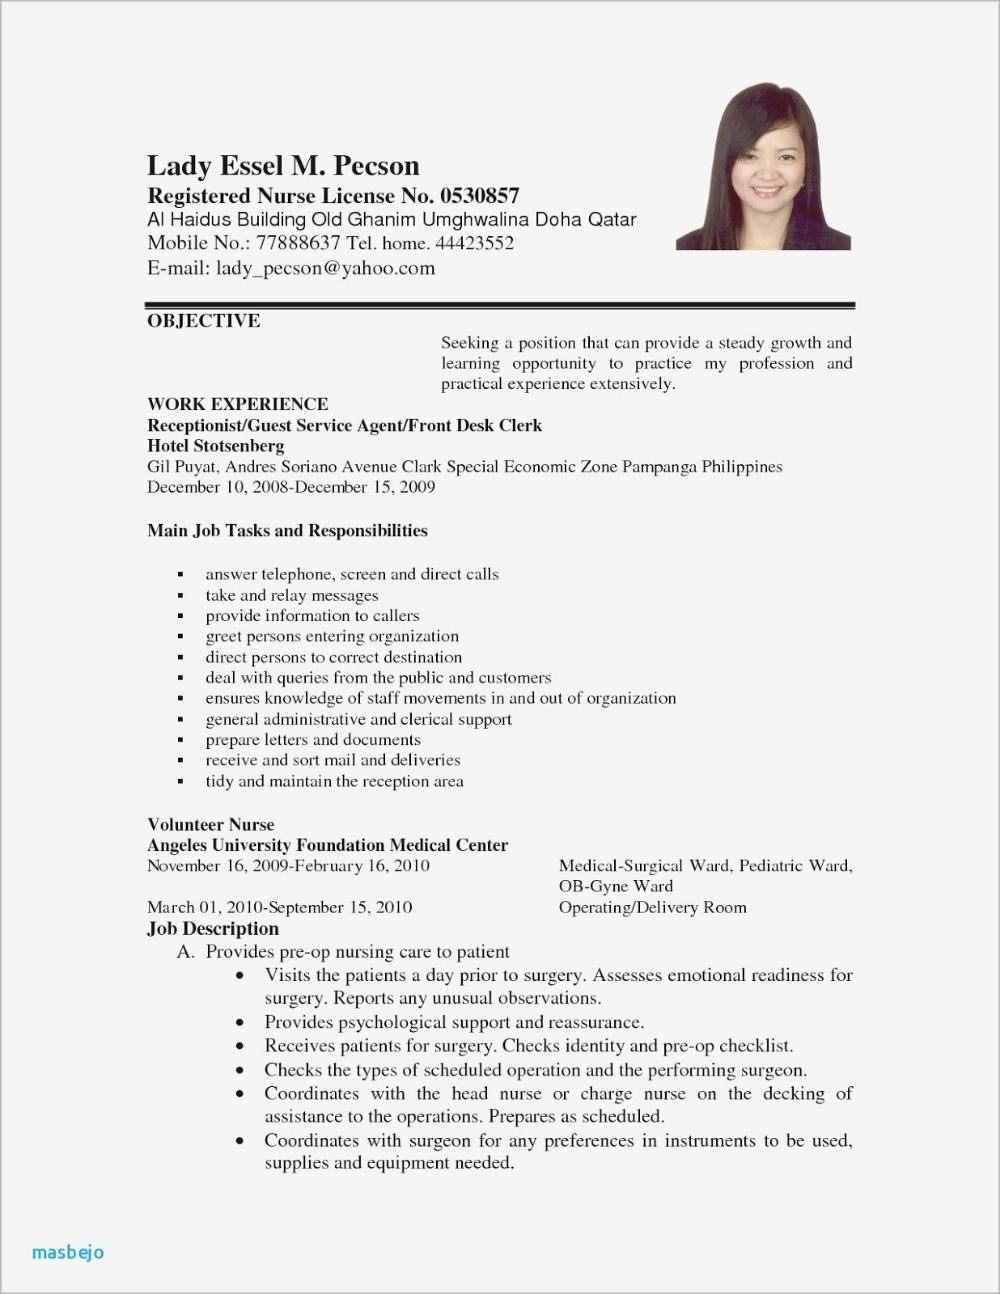 Resume Examples Pdf.Waiter Resume Sample 2019 Pdf Resume Examples Waiter 2020